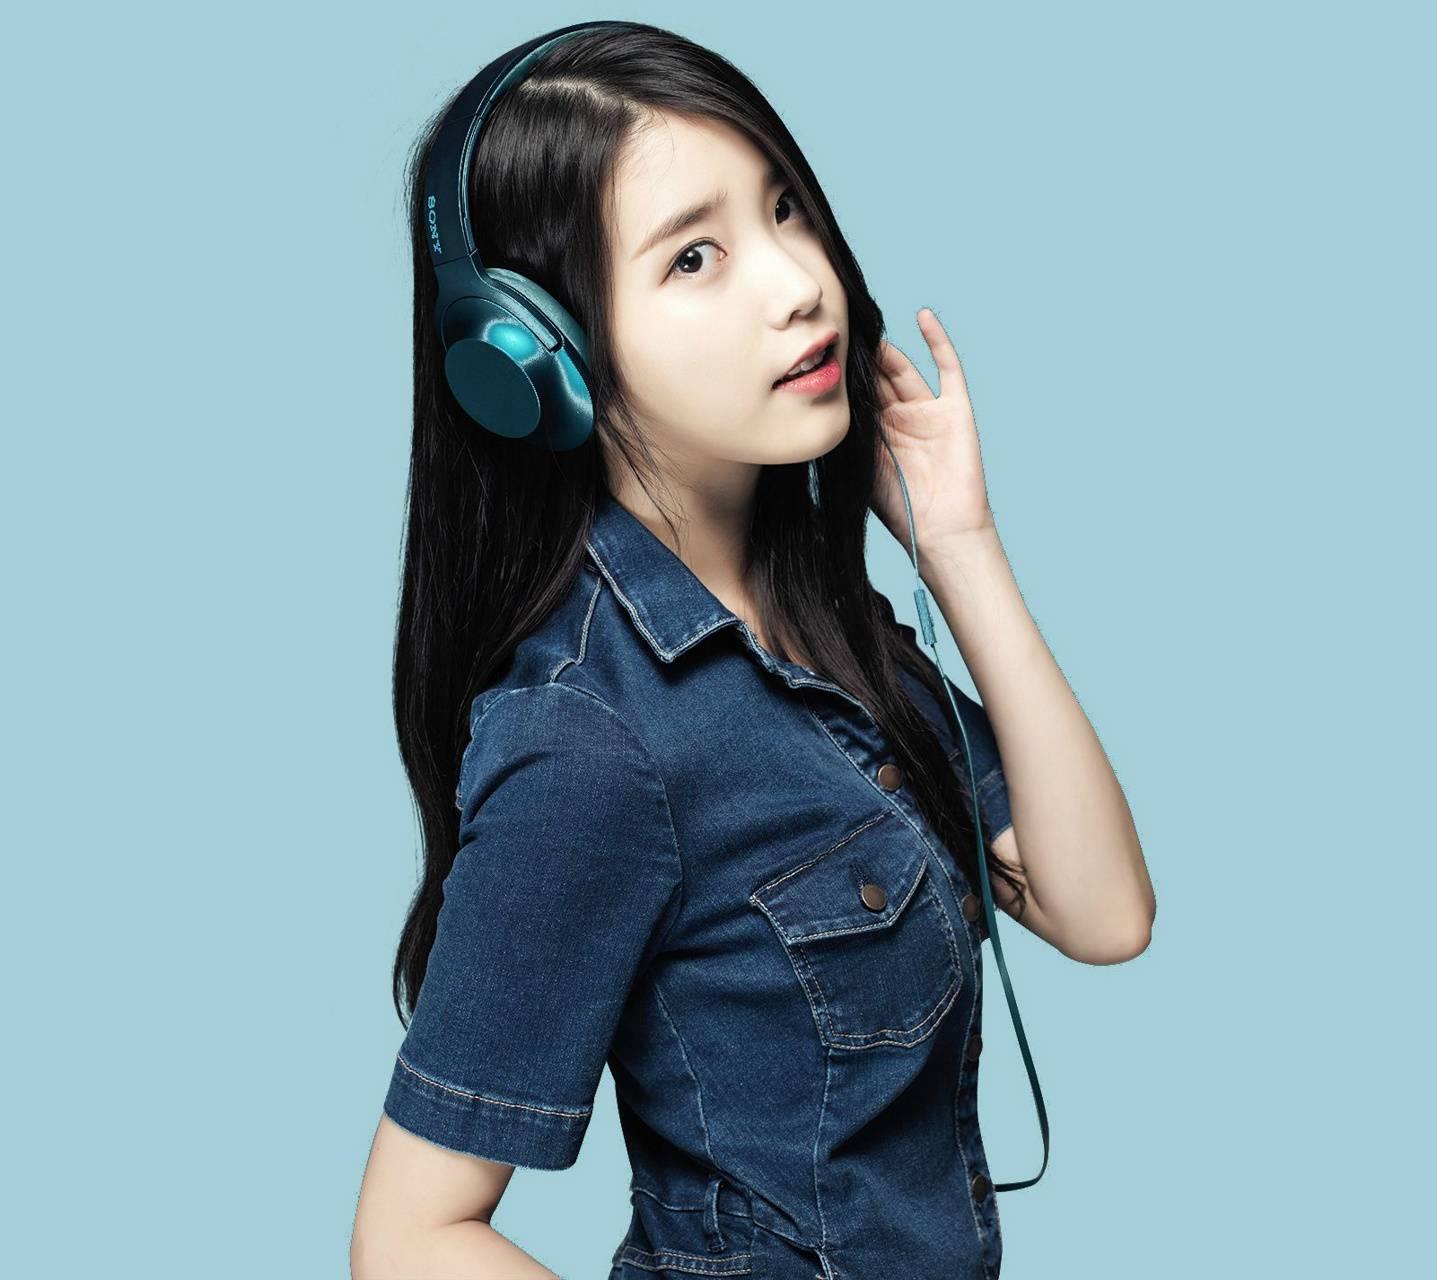 H Ear Viridian Blue